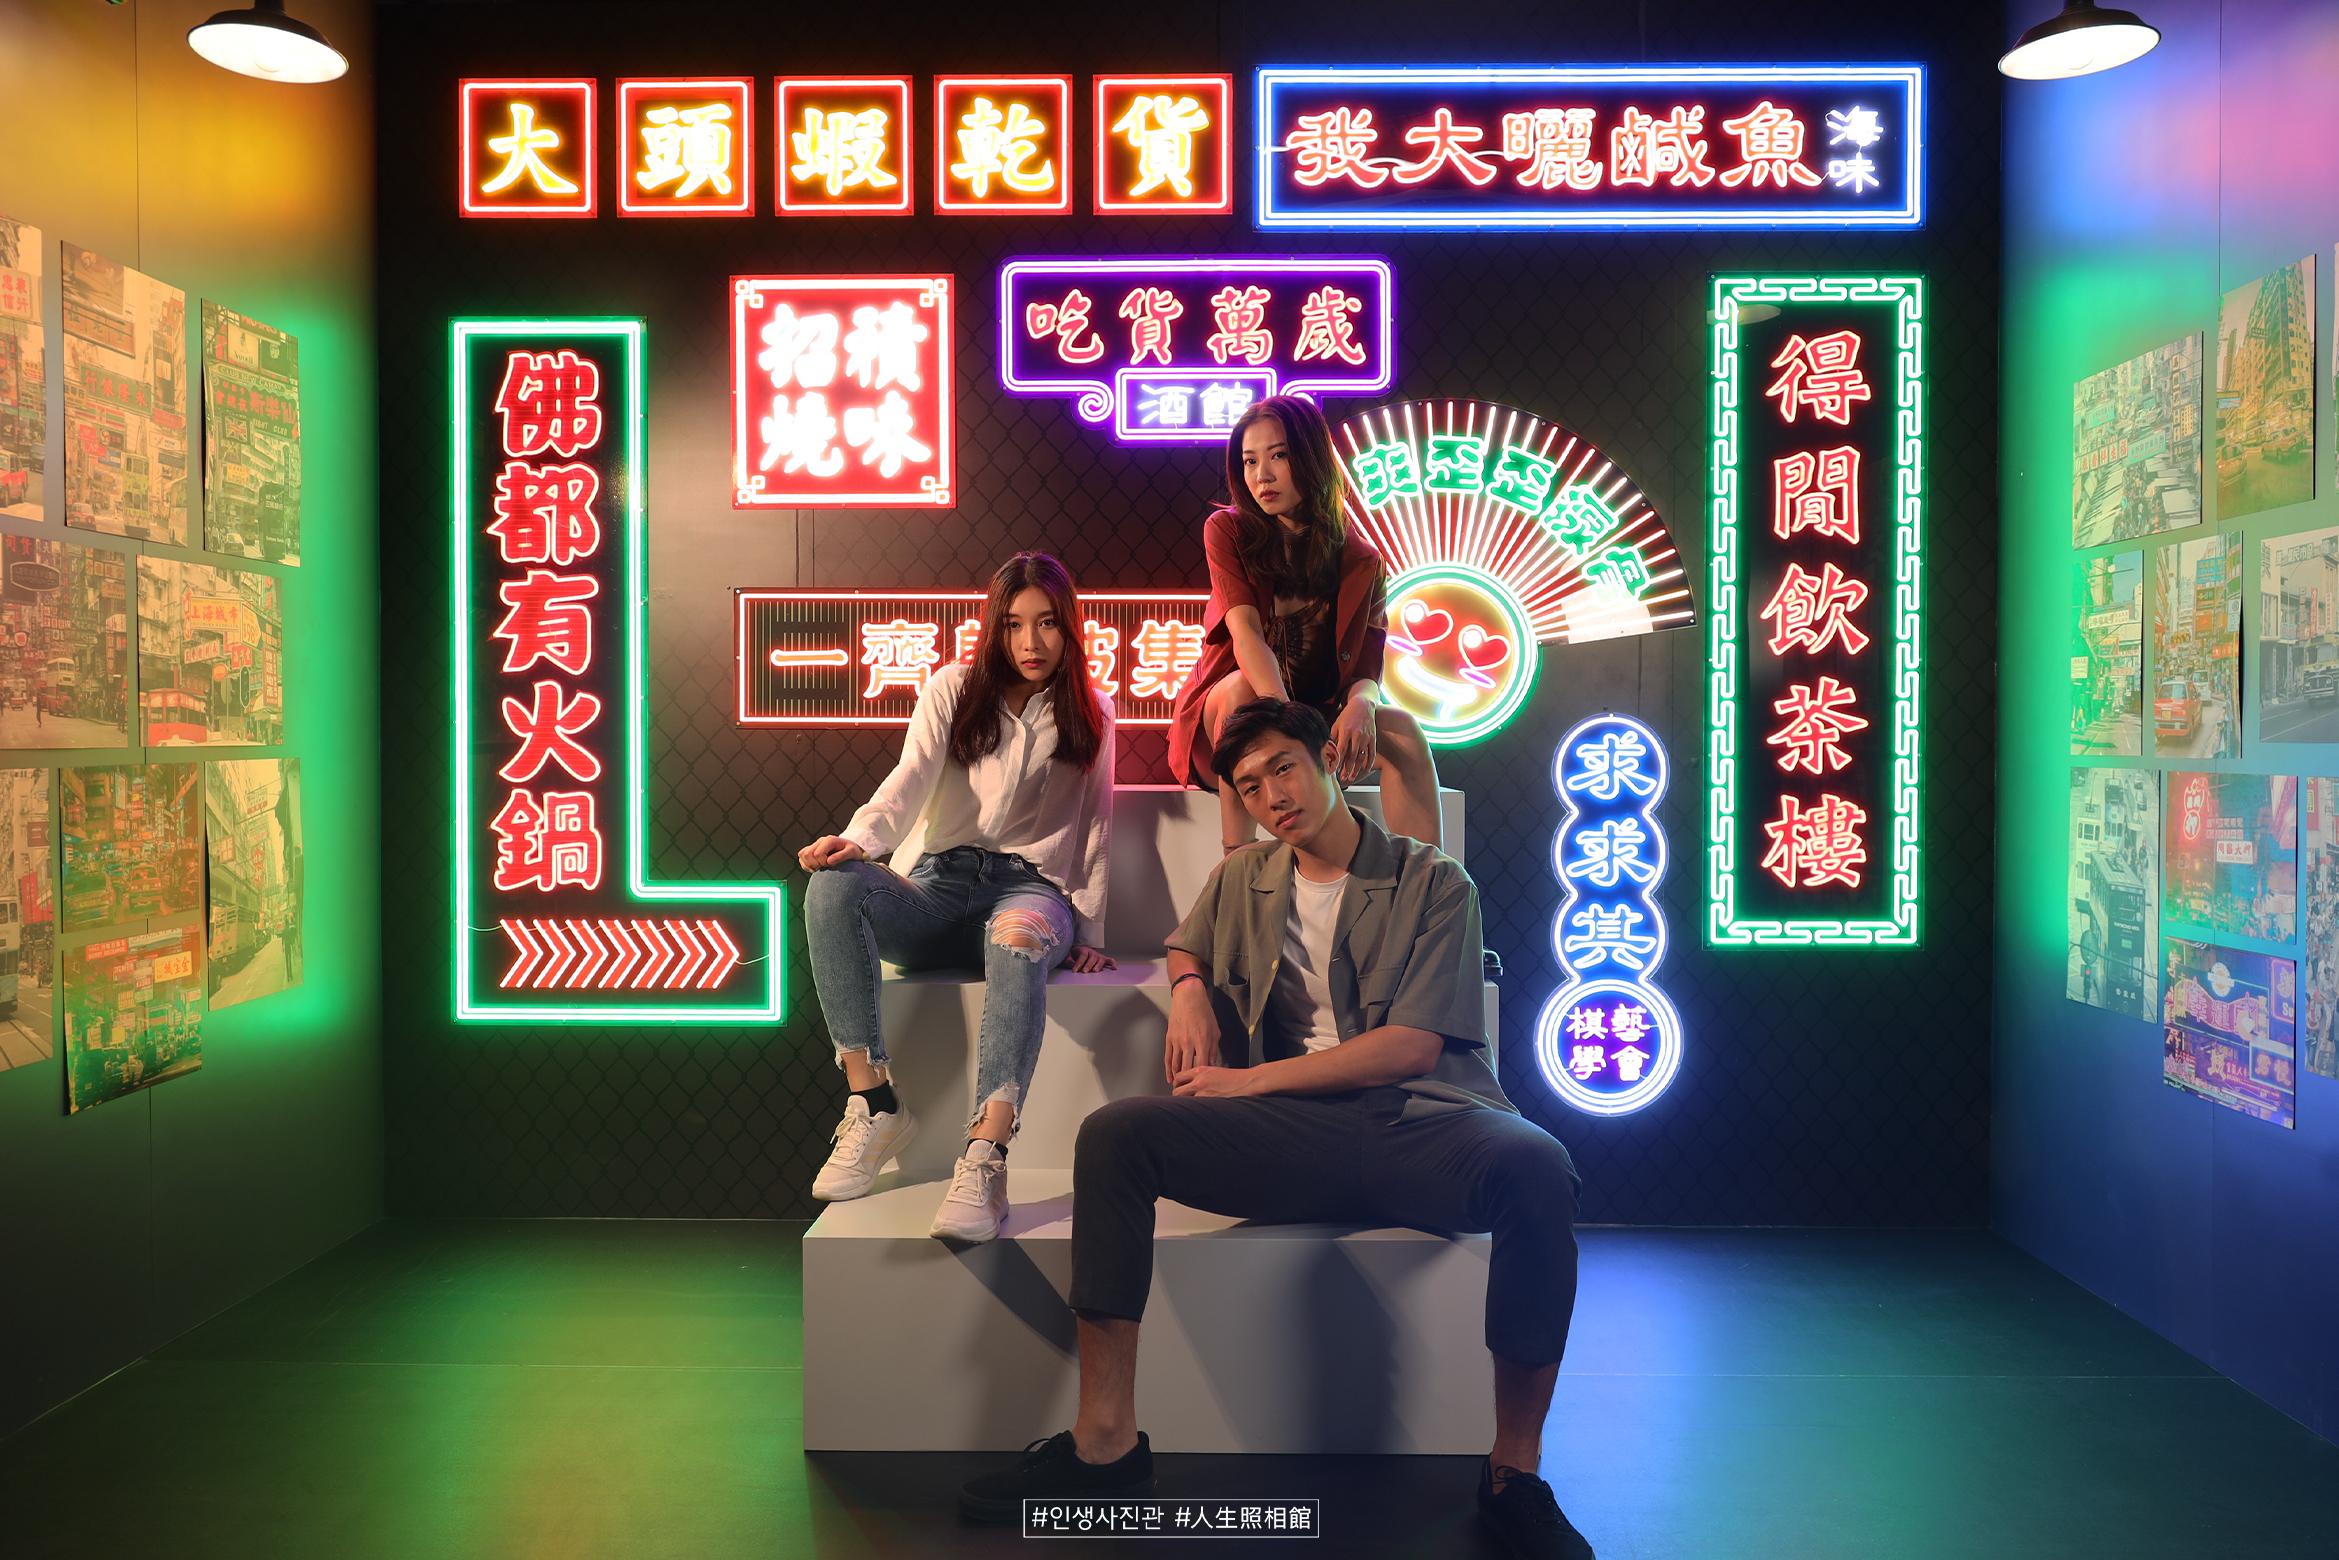 Life Photo Studio Hong Kong